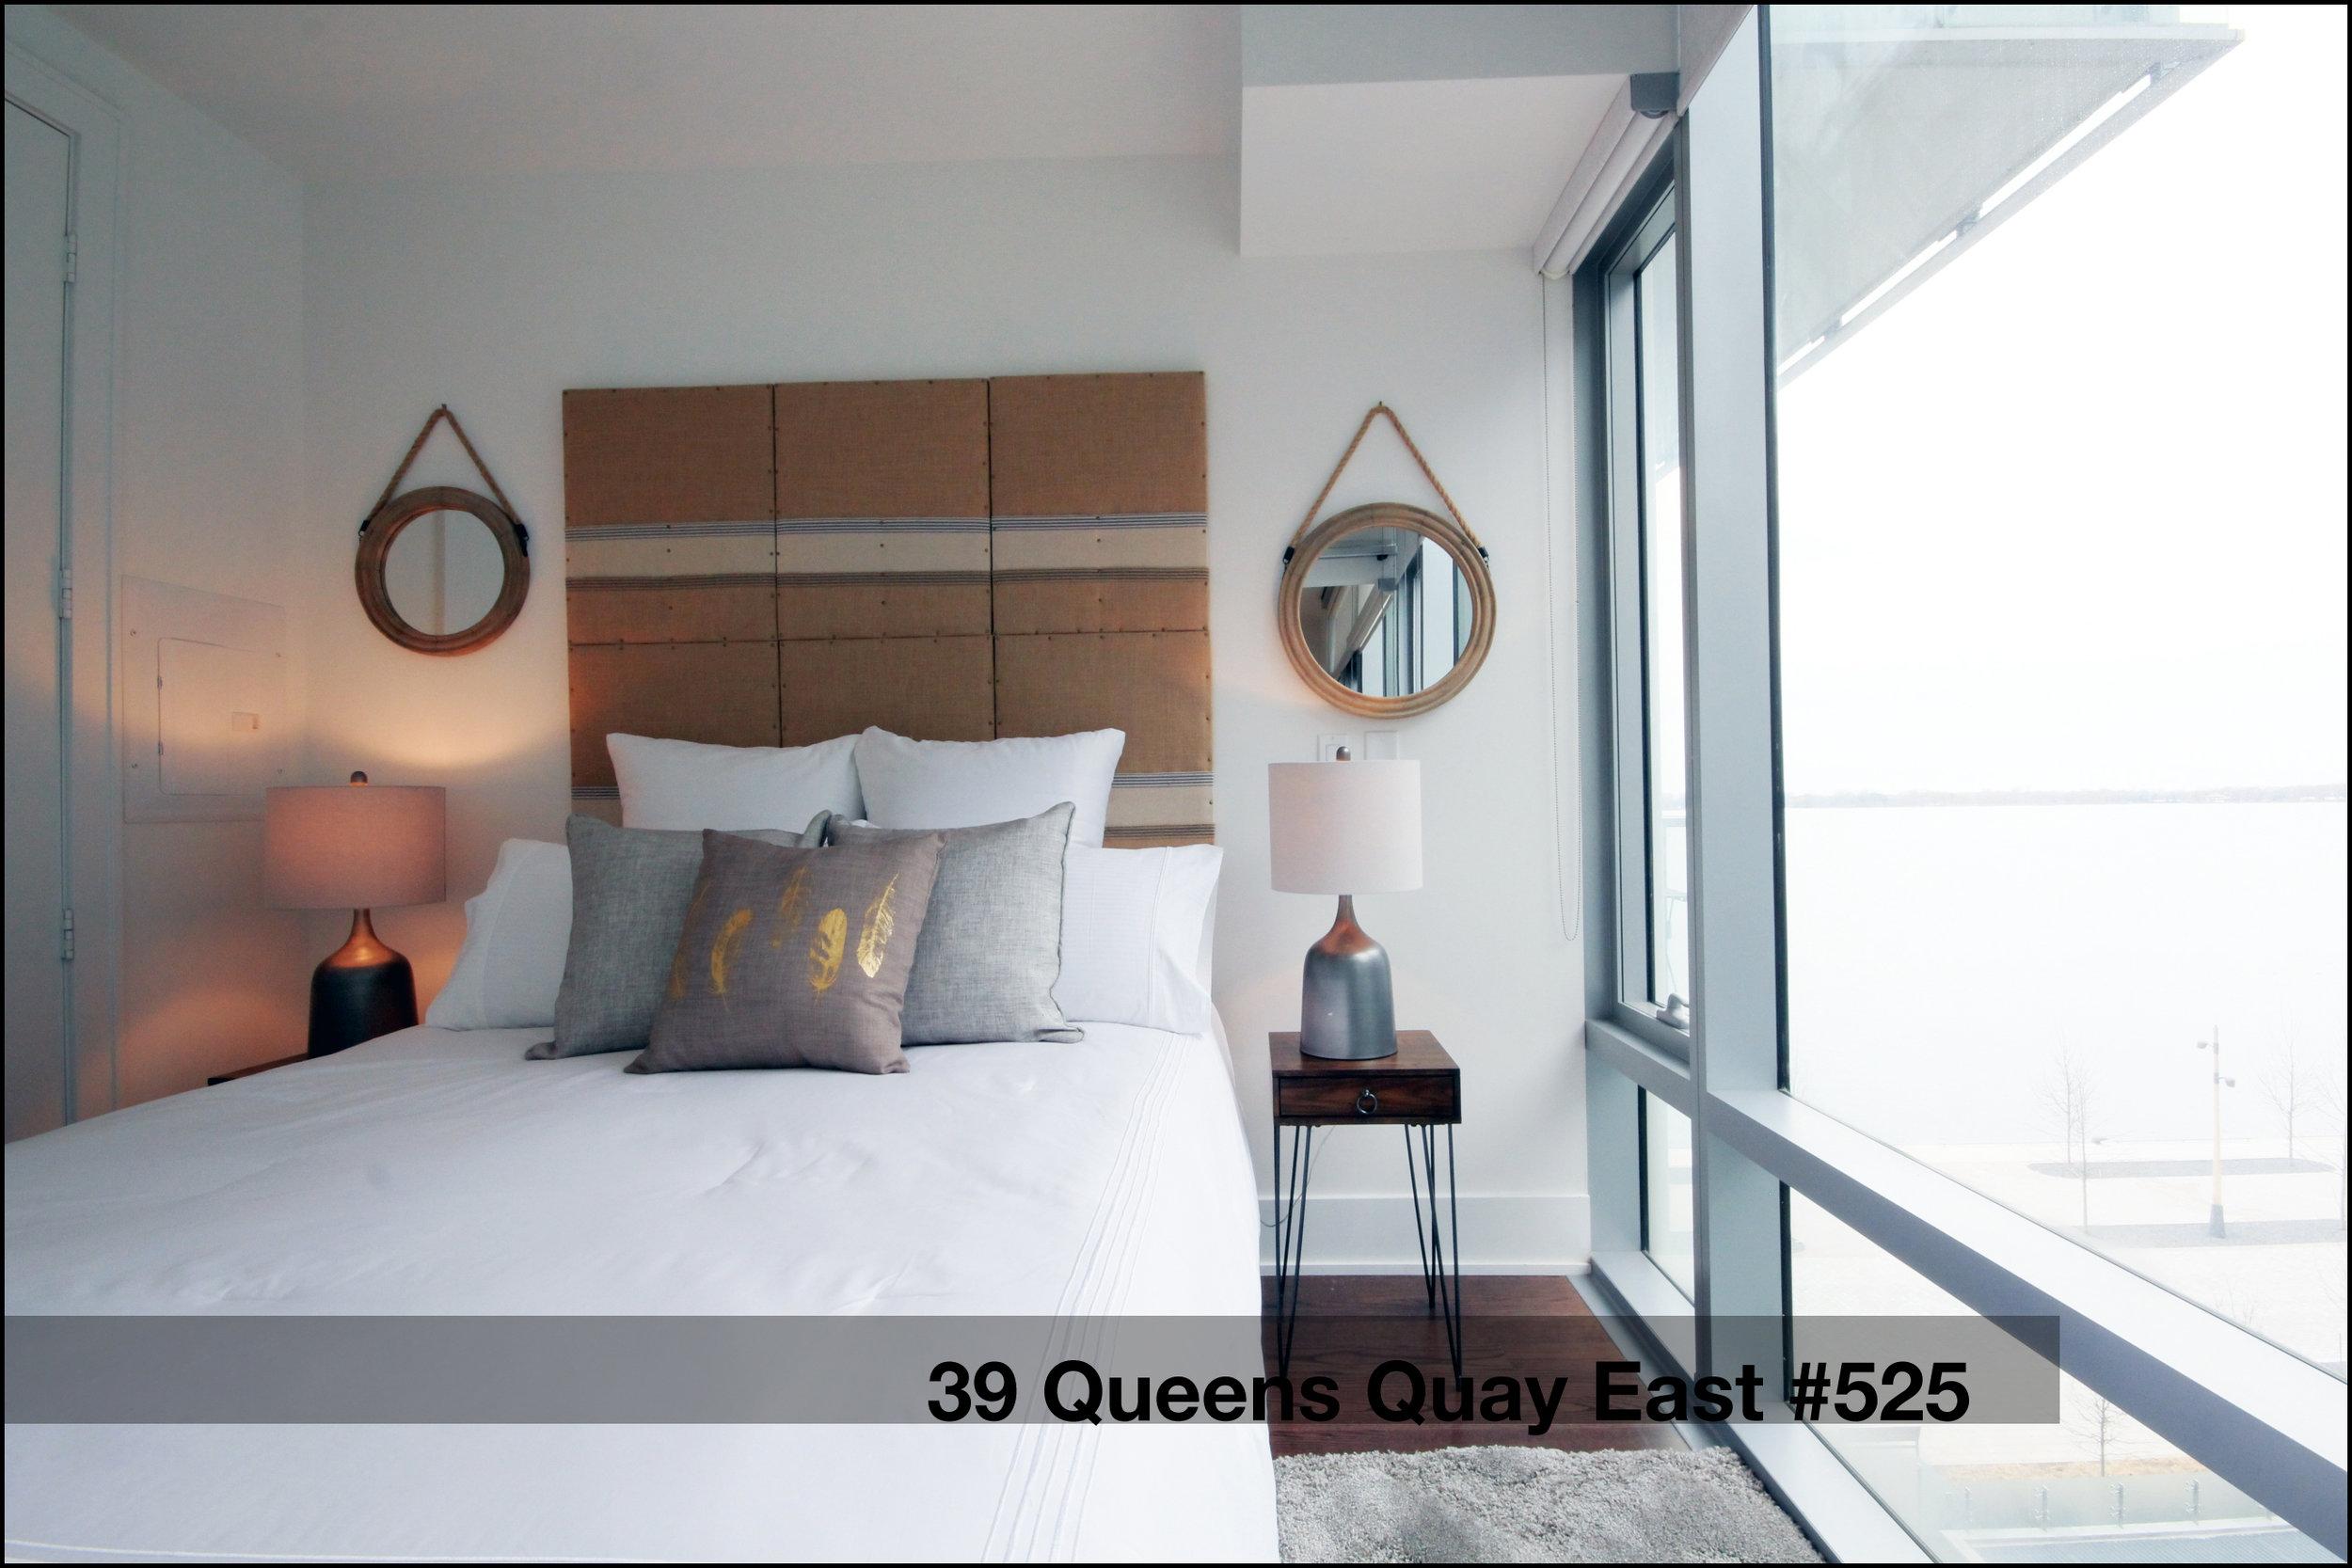 02 Bedroom copy.jpg